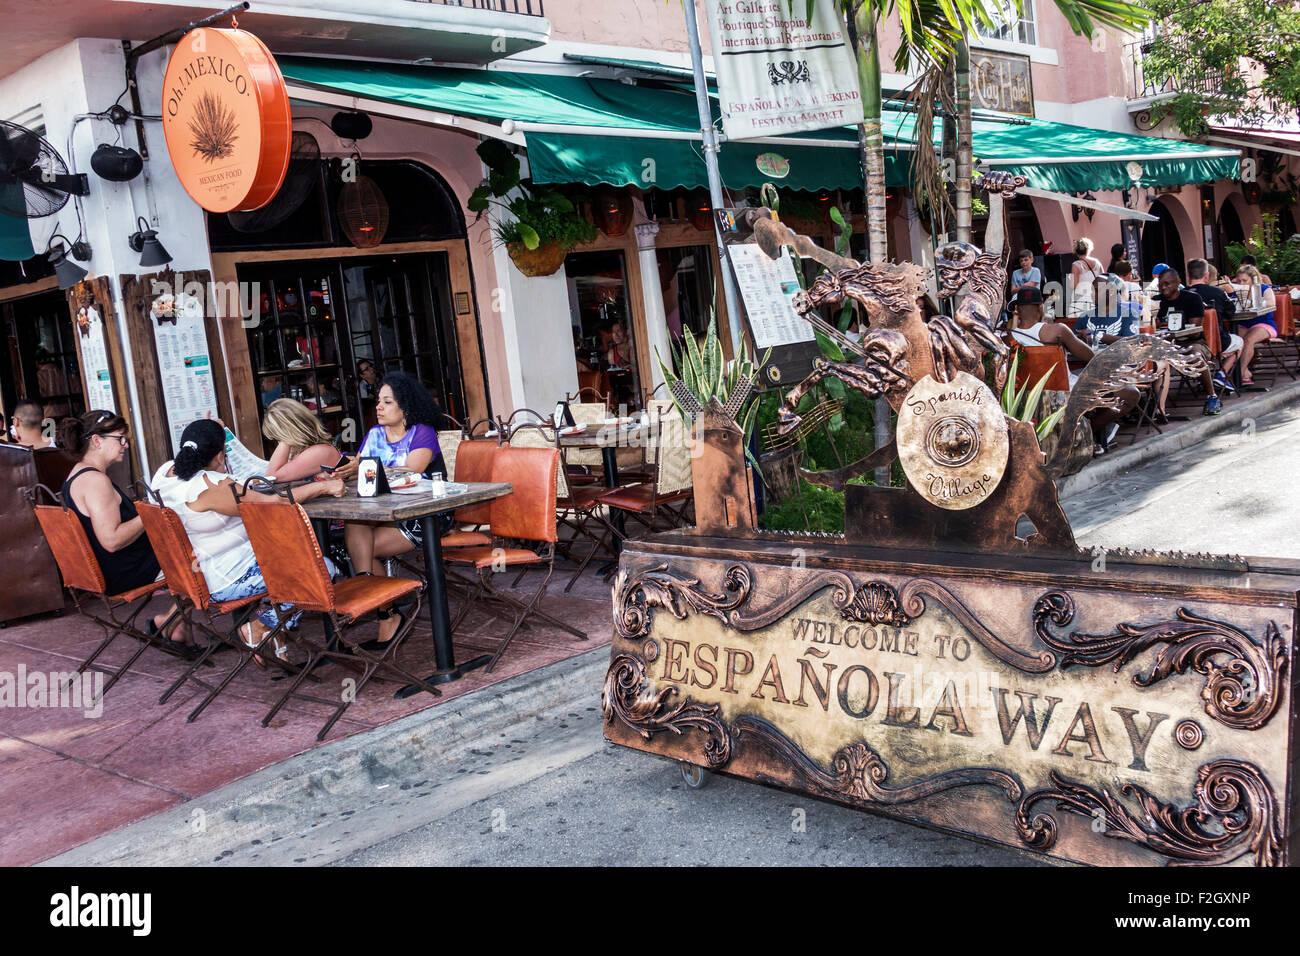 Mexican Restaurant On Espanola Way Miami Beach